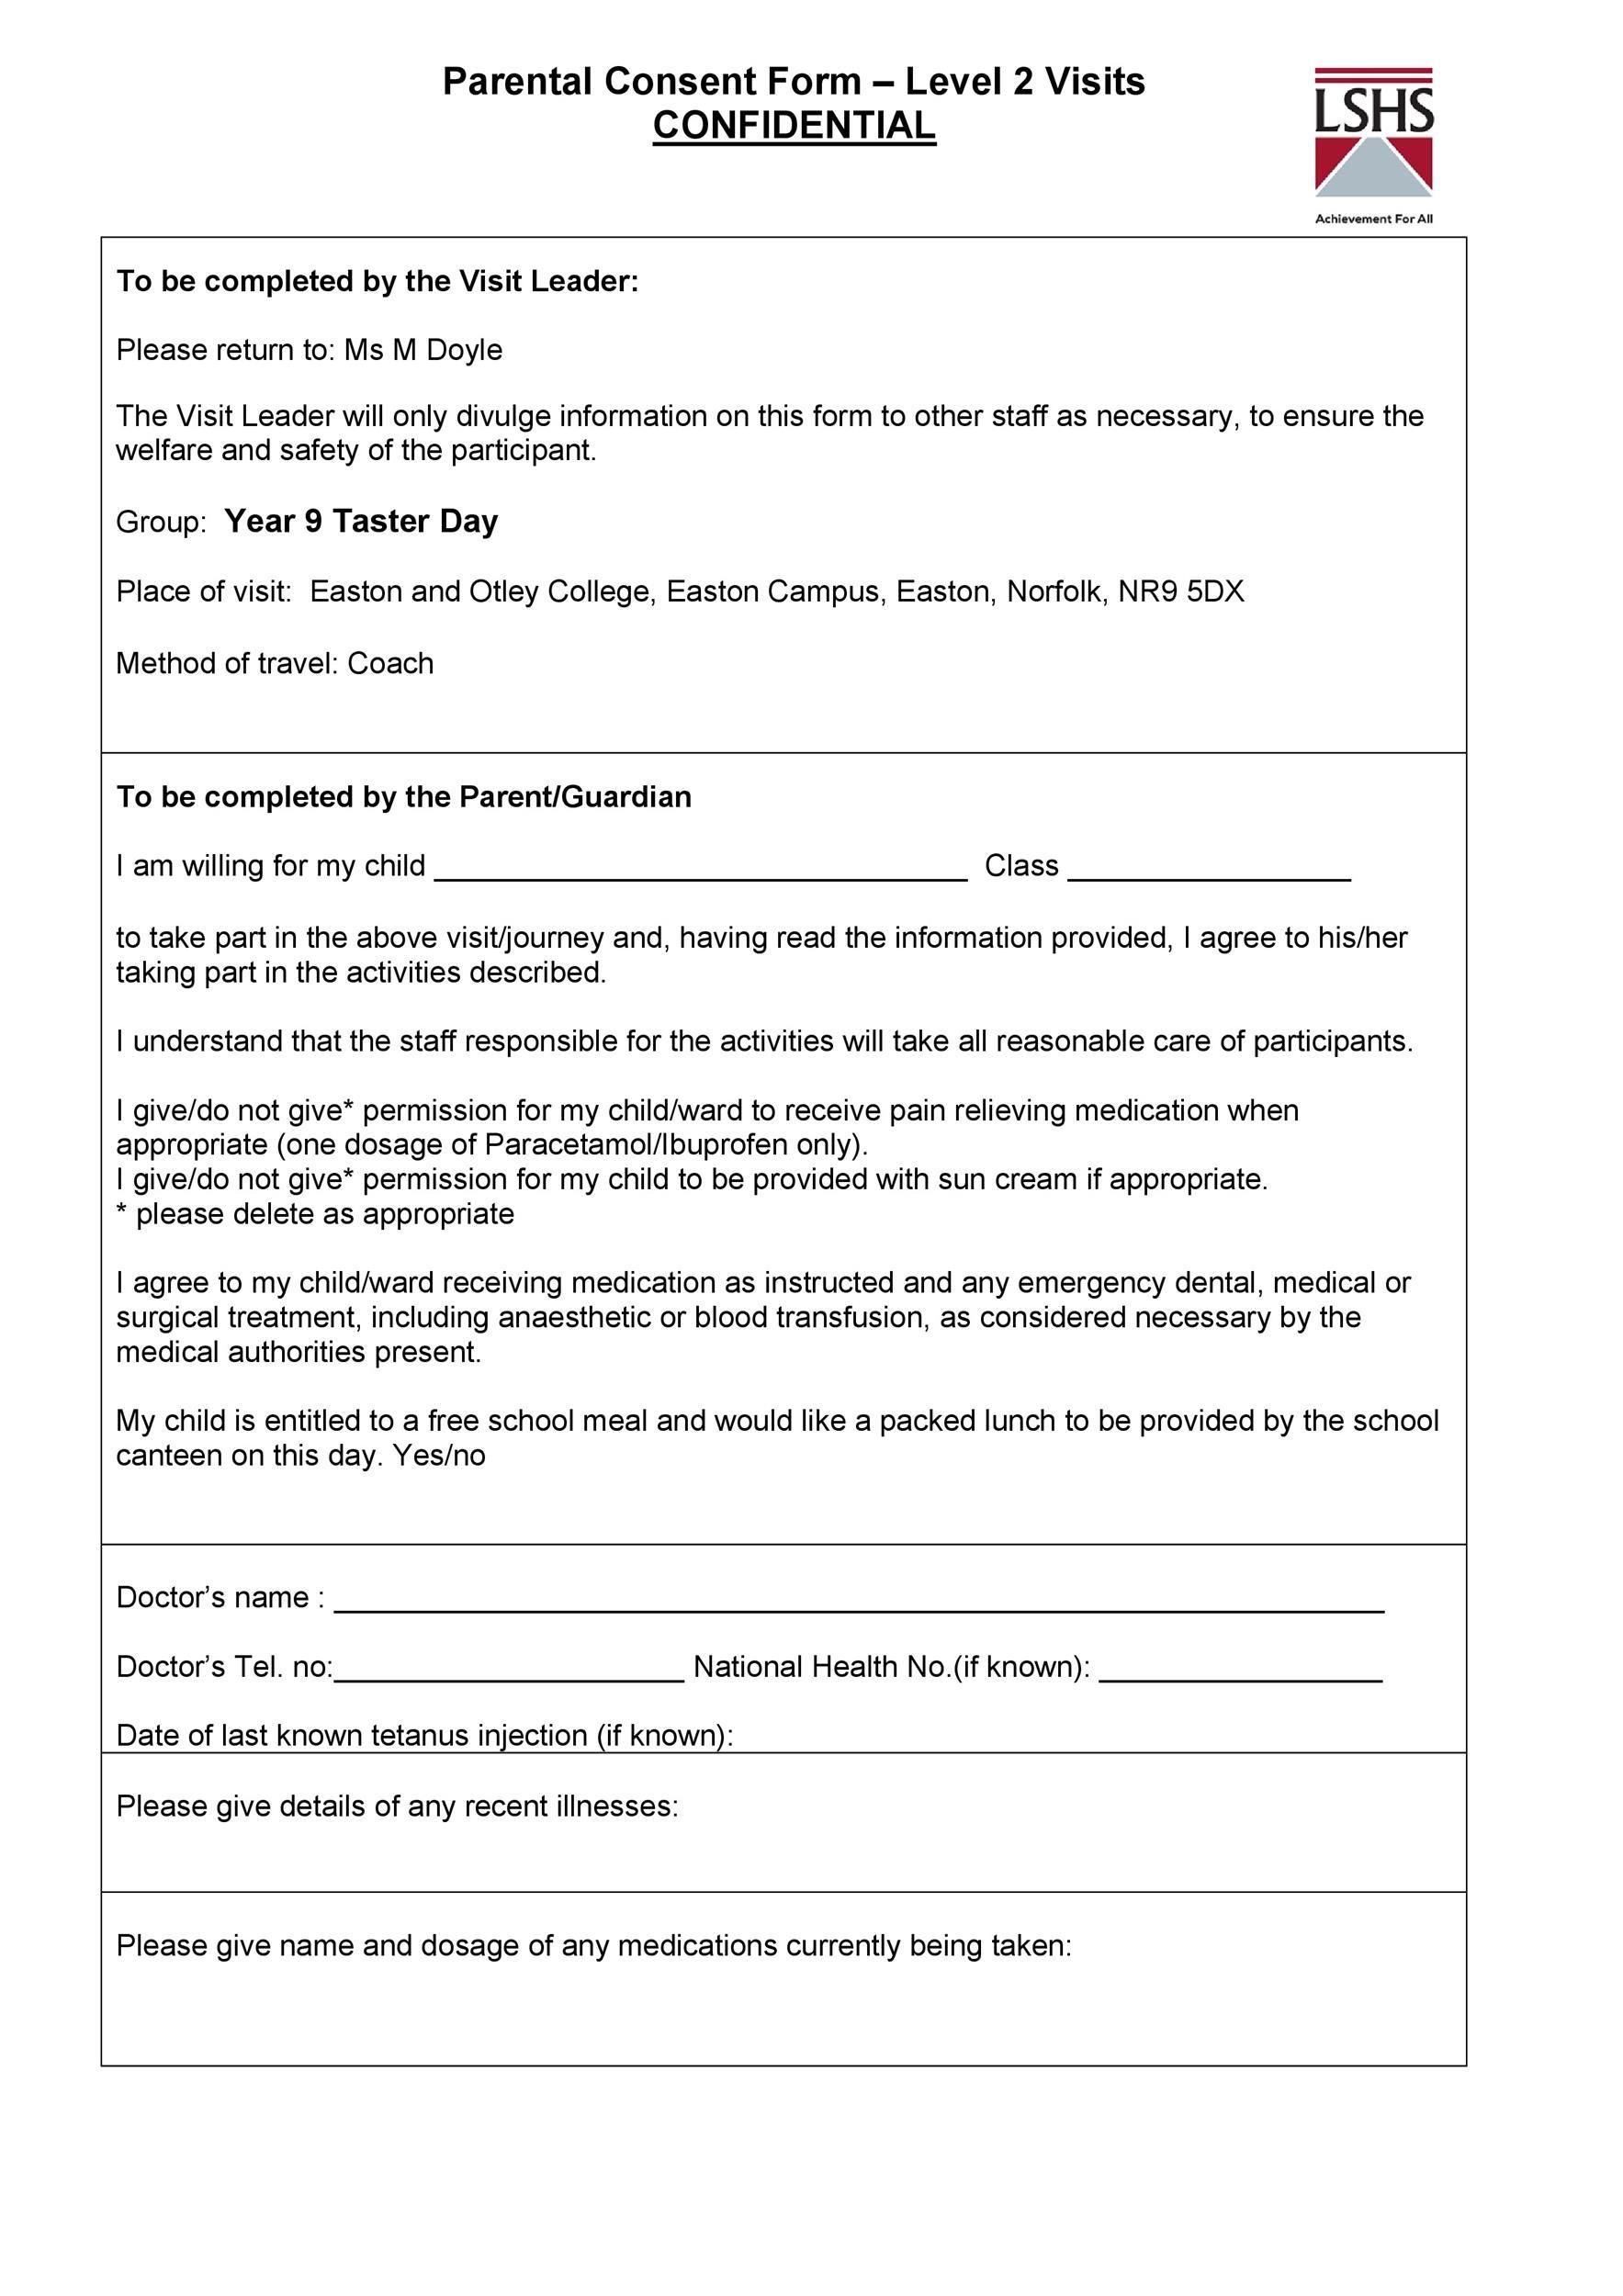 009 Breathtaking Free Medical Consent Form Template Image  Child Pdf UkFull